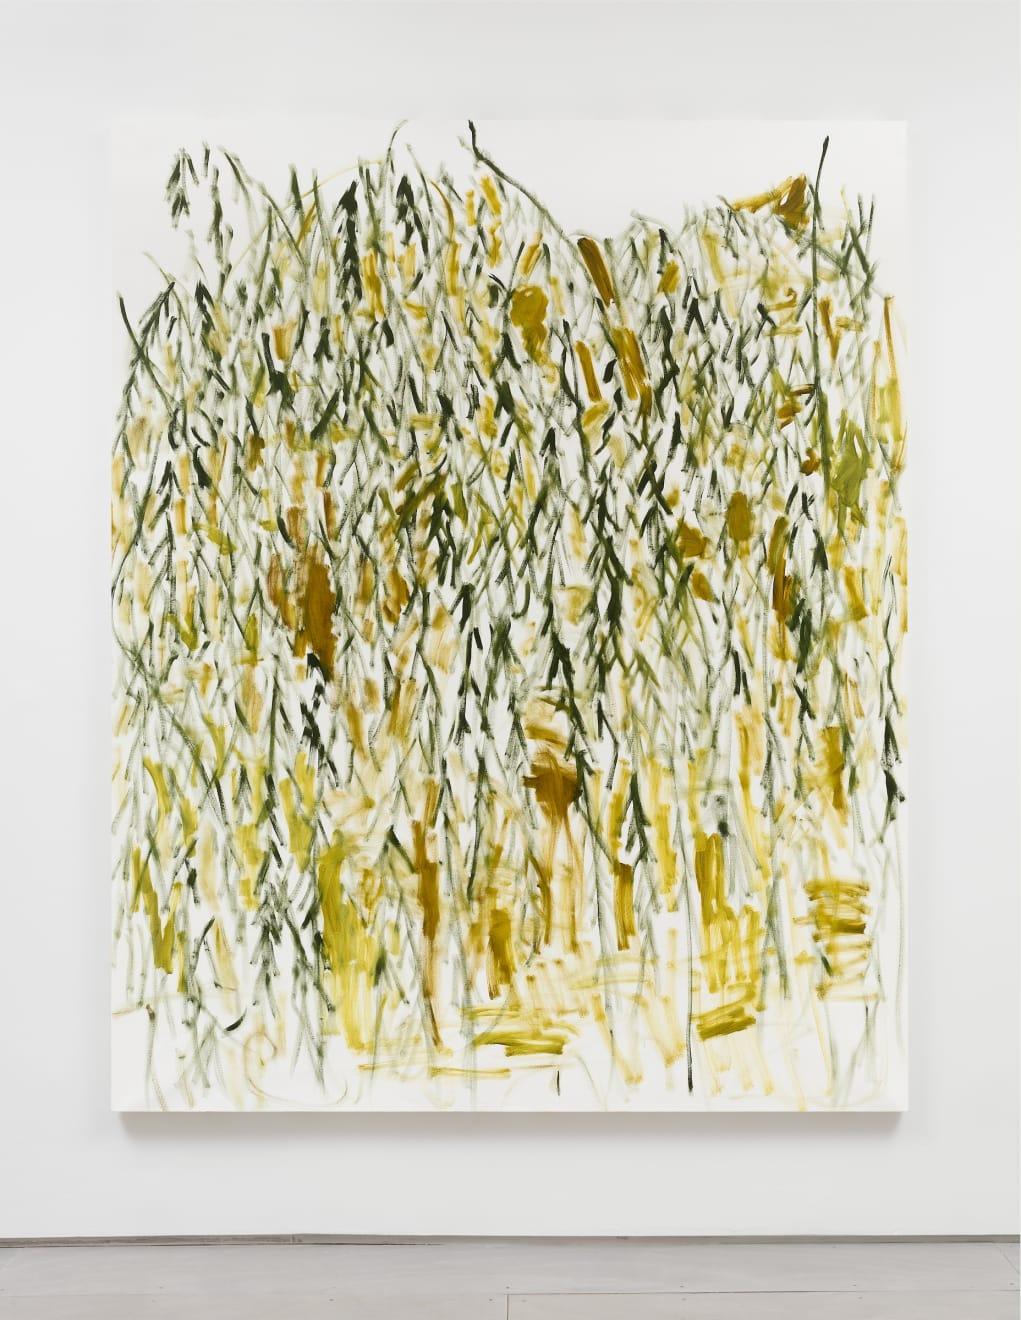 Trevor Shimizu, Weeping Willow (1), 2019